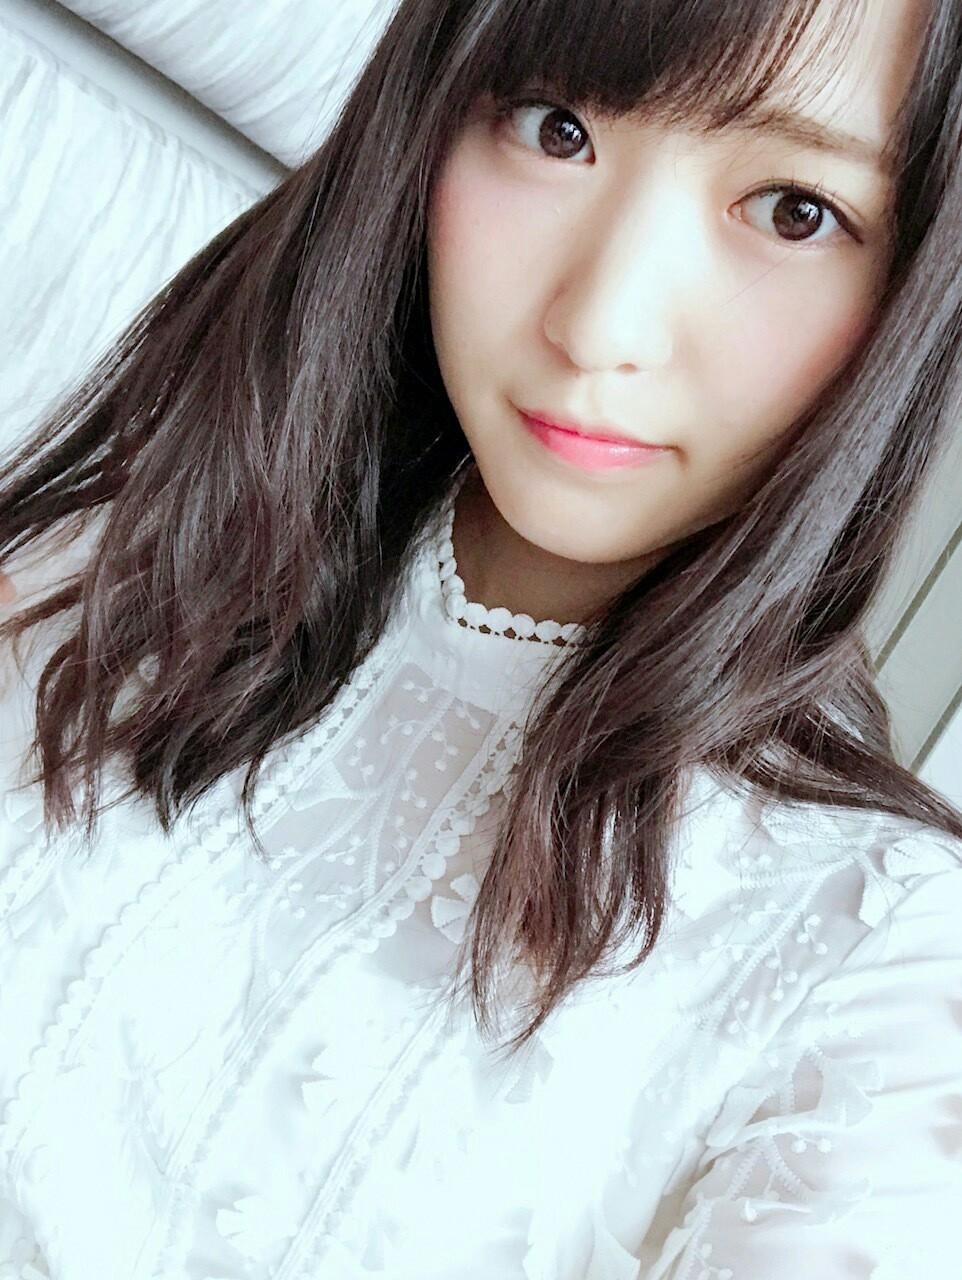 f:id:asitaha46:20170926022015j:image